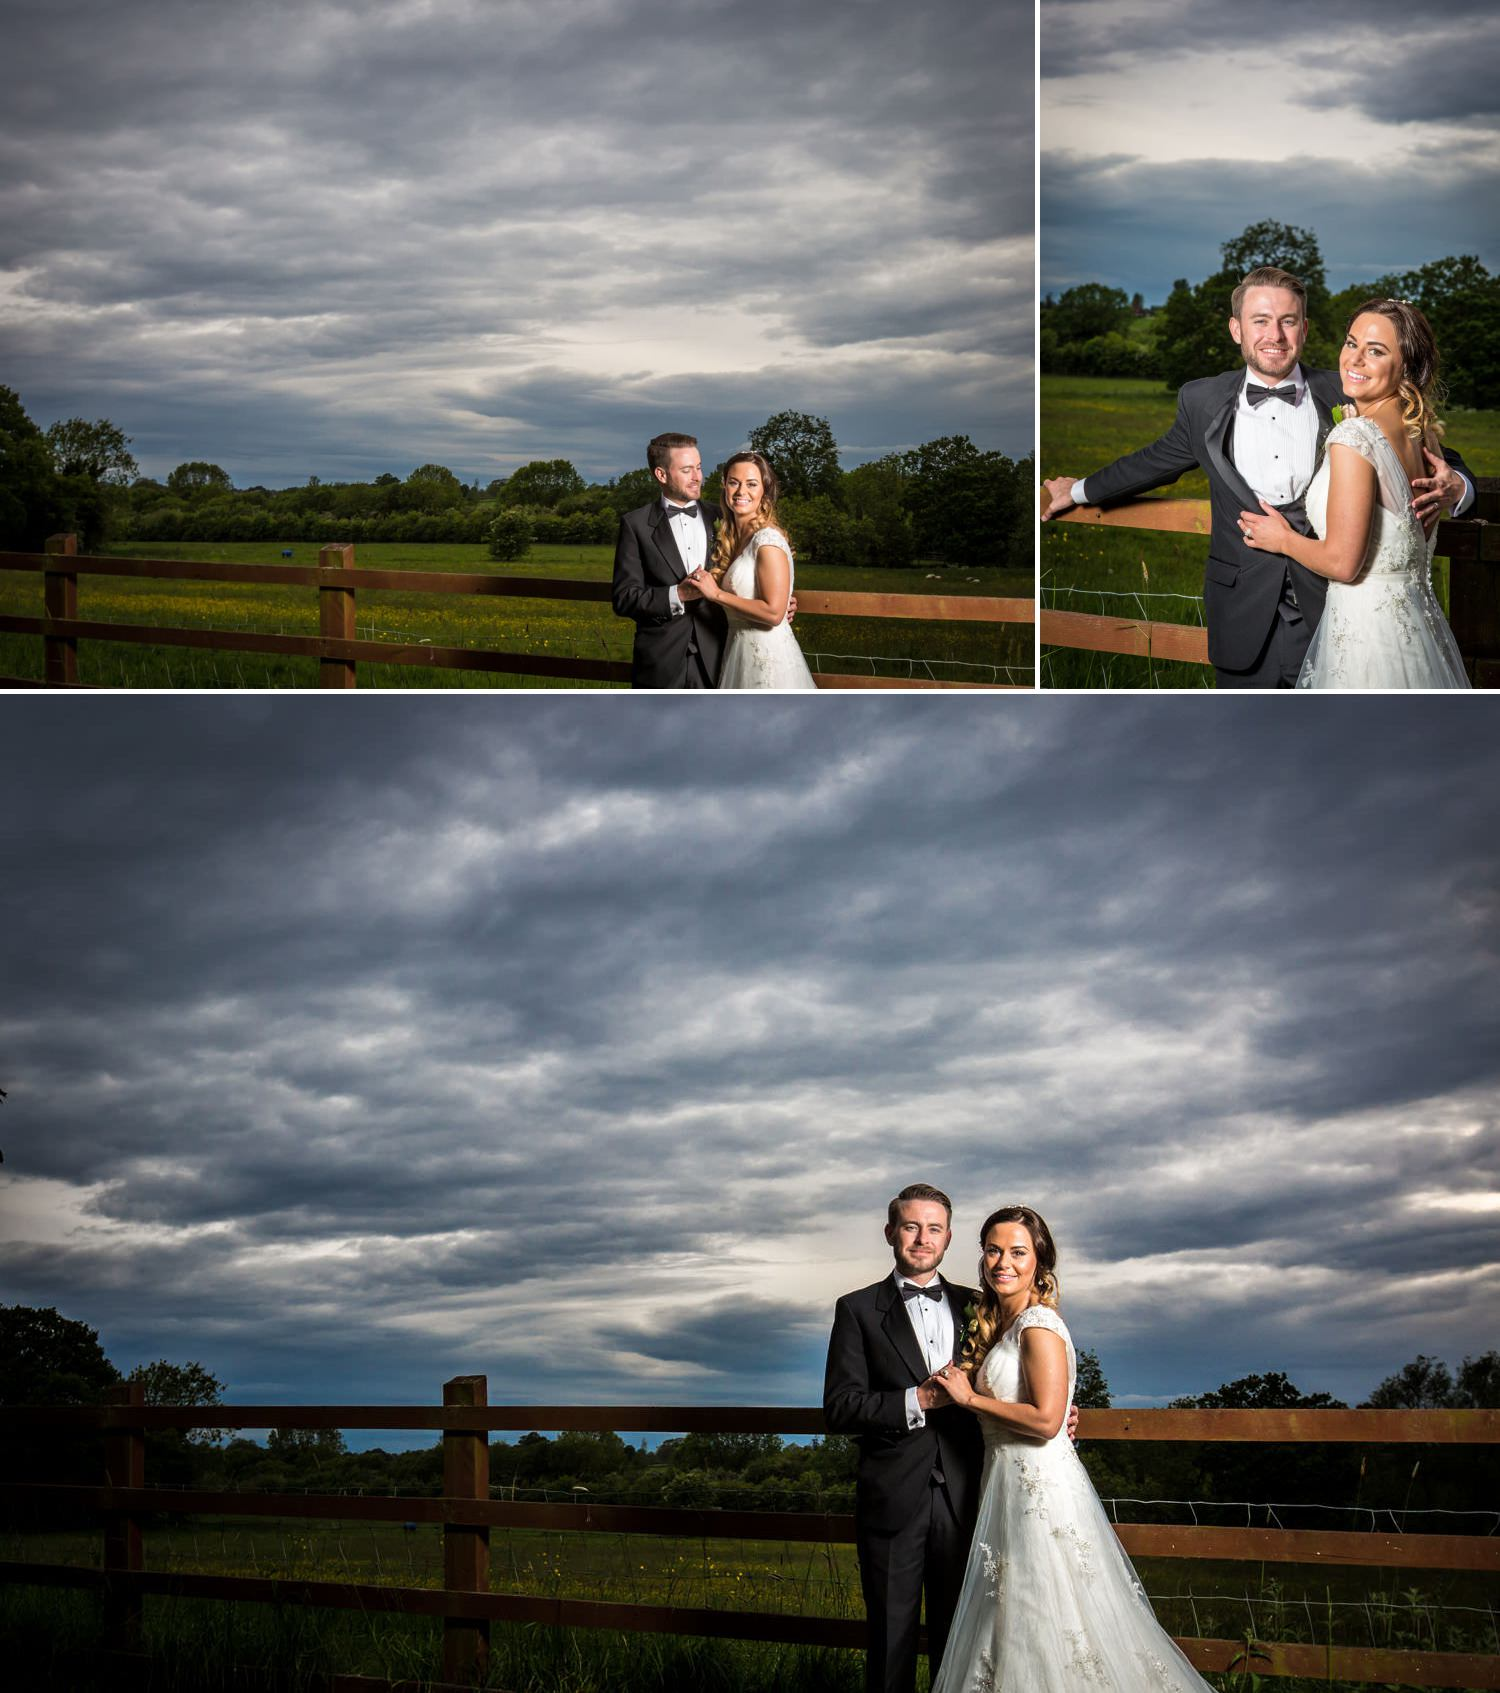 Wedding Photography Shropshire, evening wedding portraits